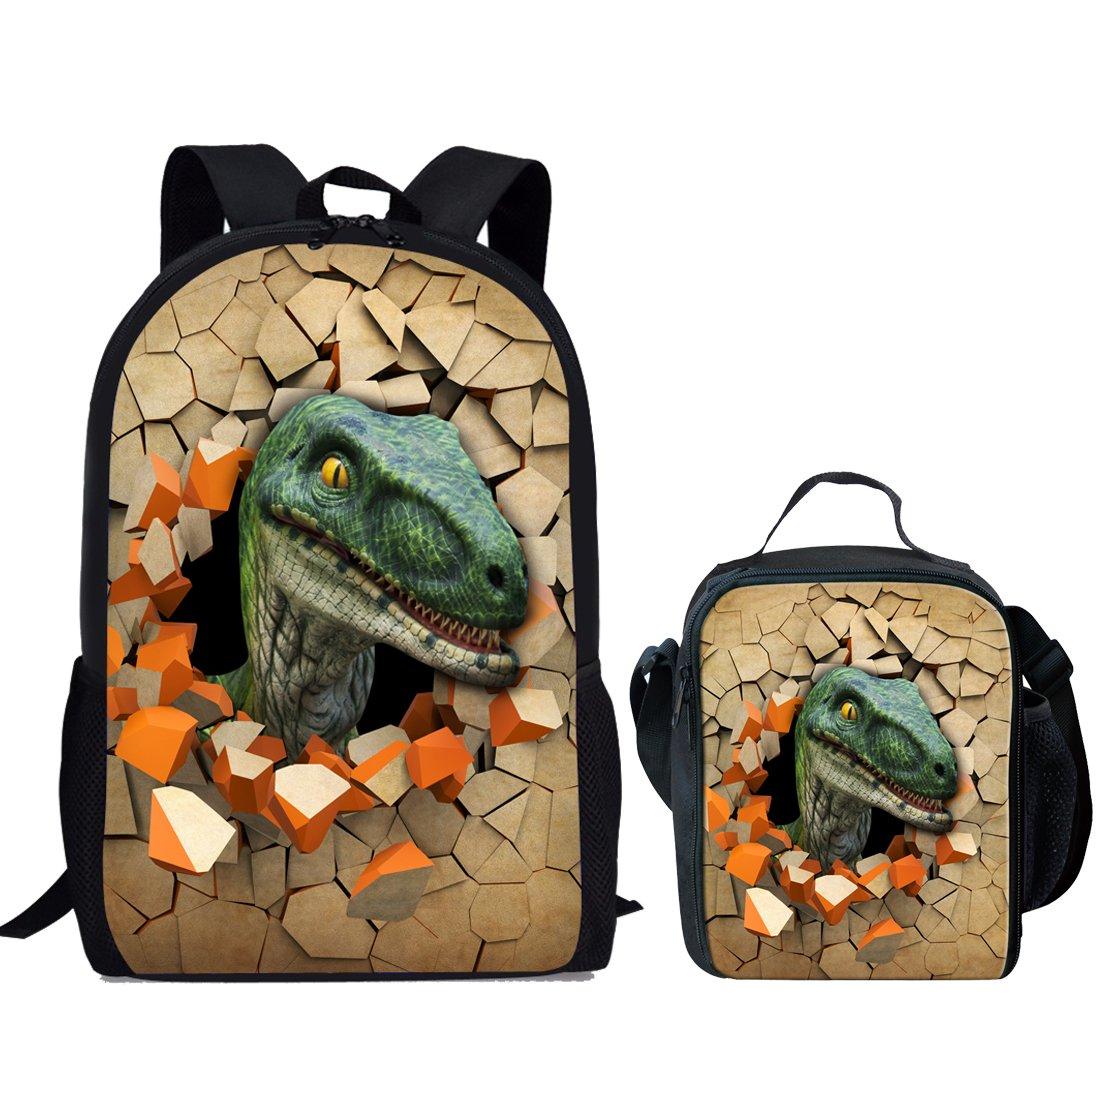 Showudesigns Cool Dinosaur Bookbag School Backpack and Lunch Bag for Boys Kids Elementary